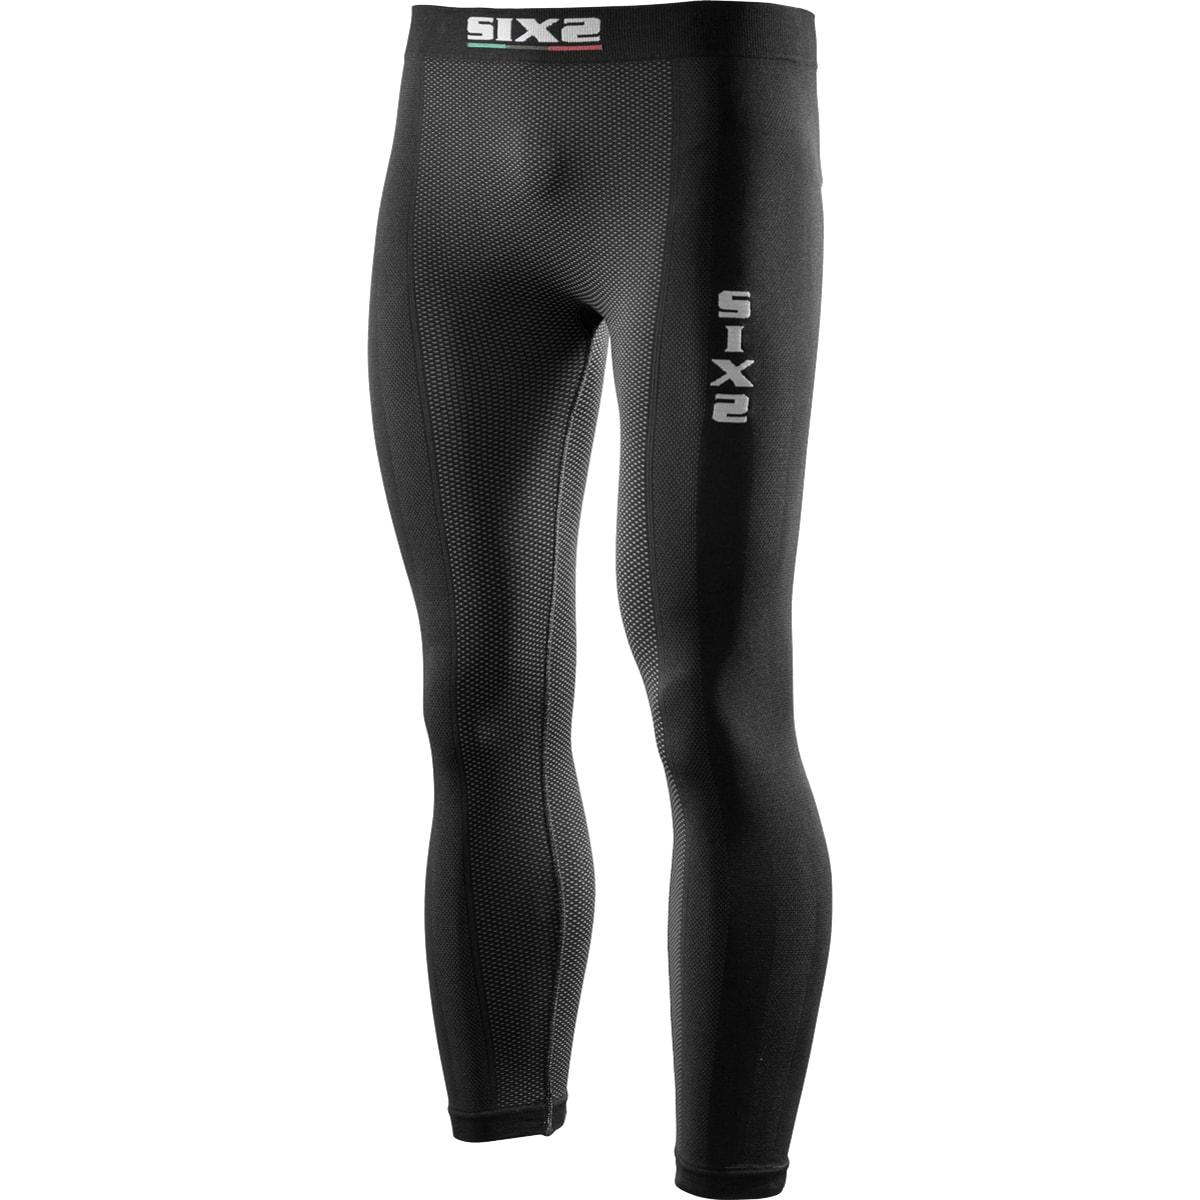 義大利 SIXS <br>機能碳運動長褲 <br>碳纖黑 <br>PNX BLACK